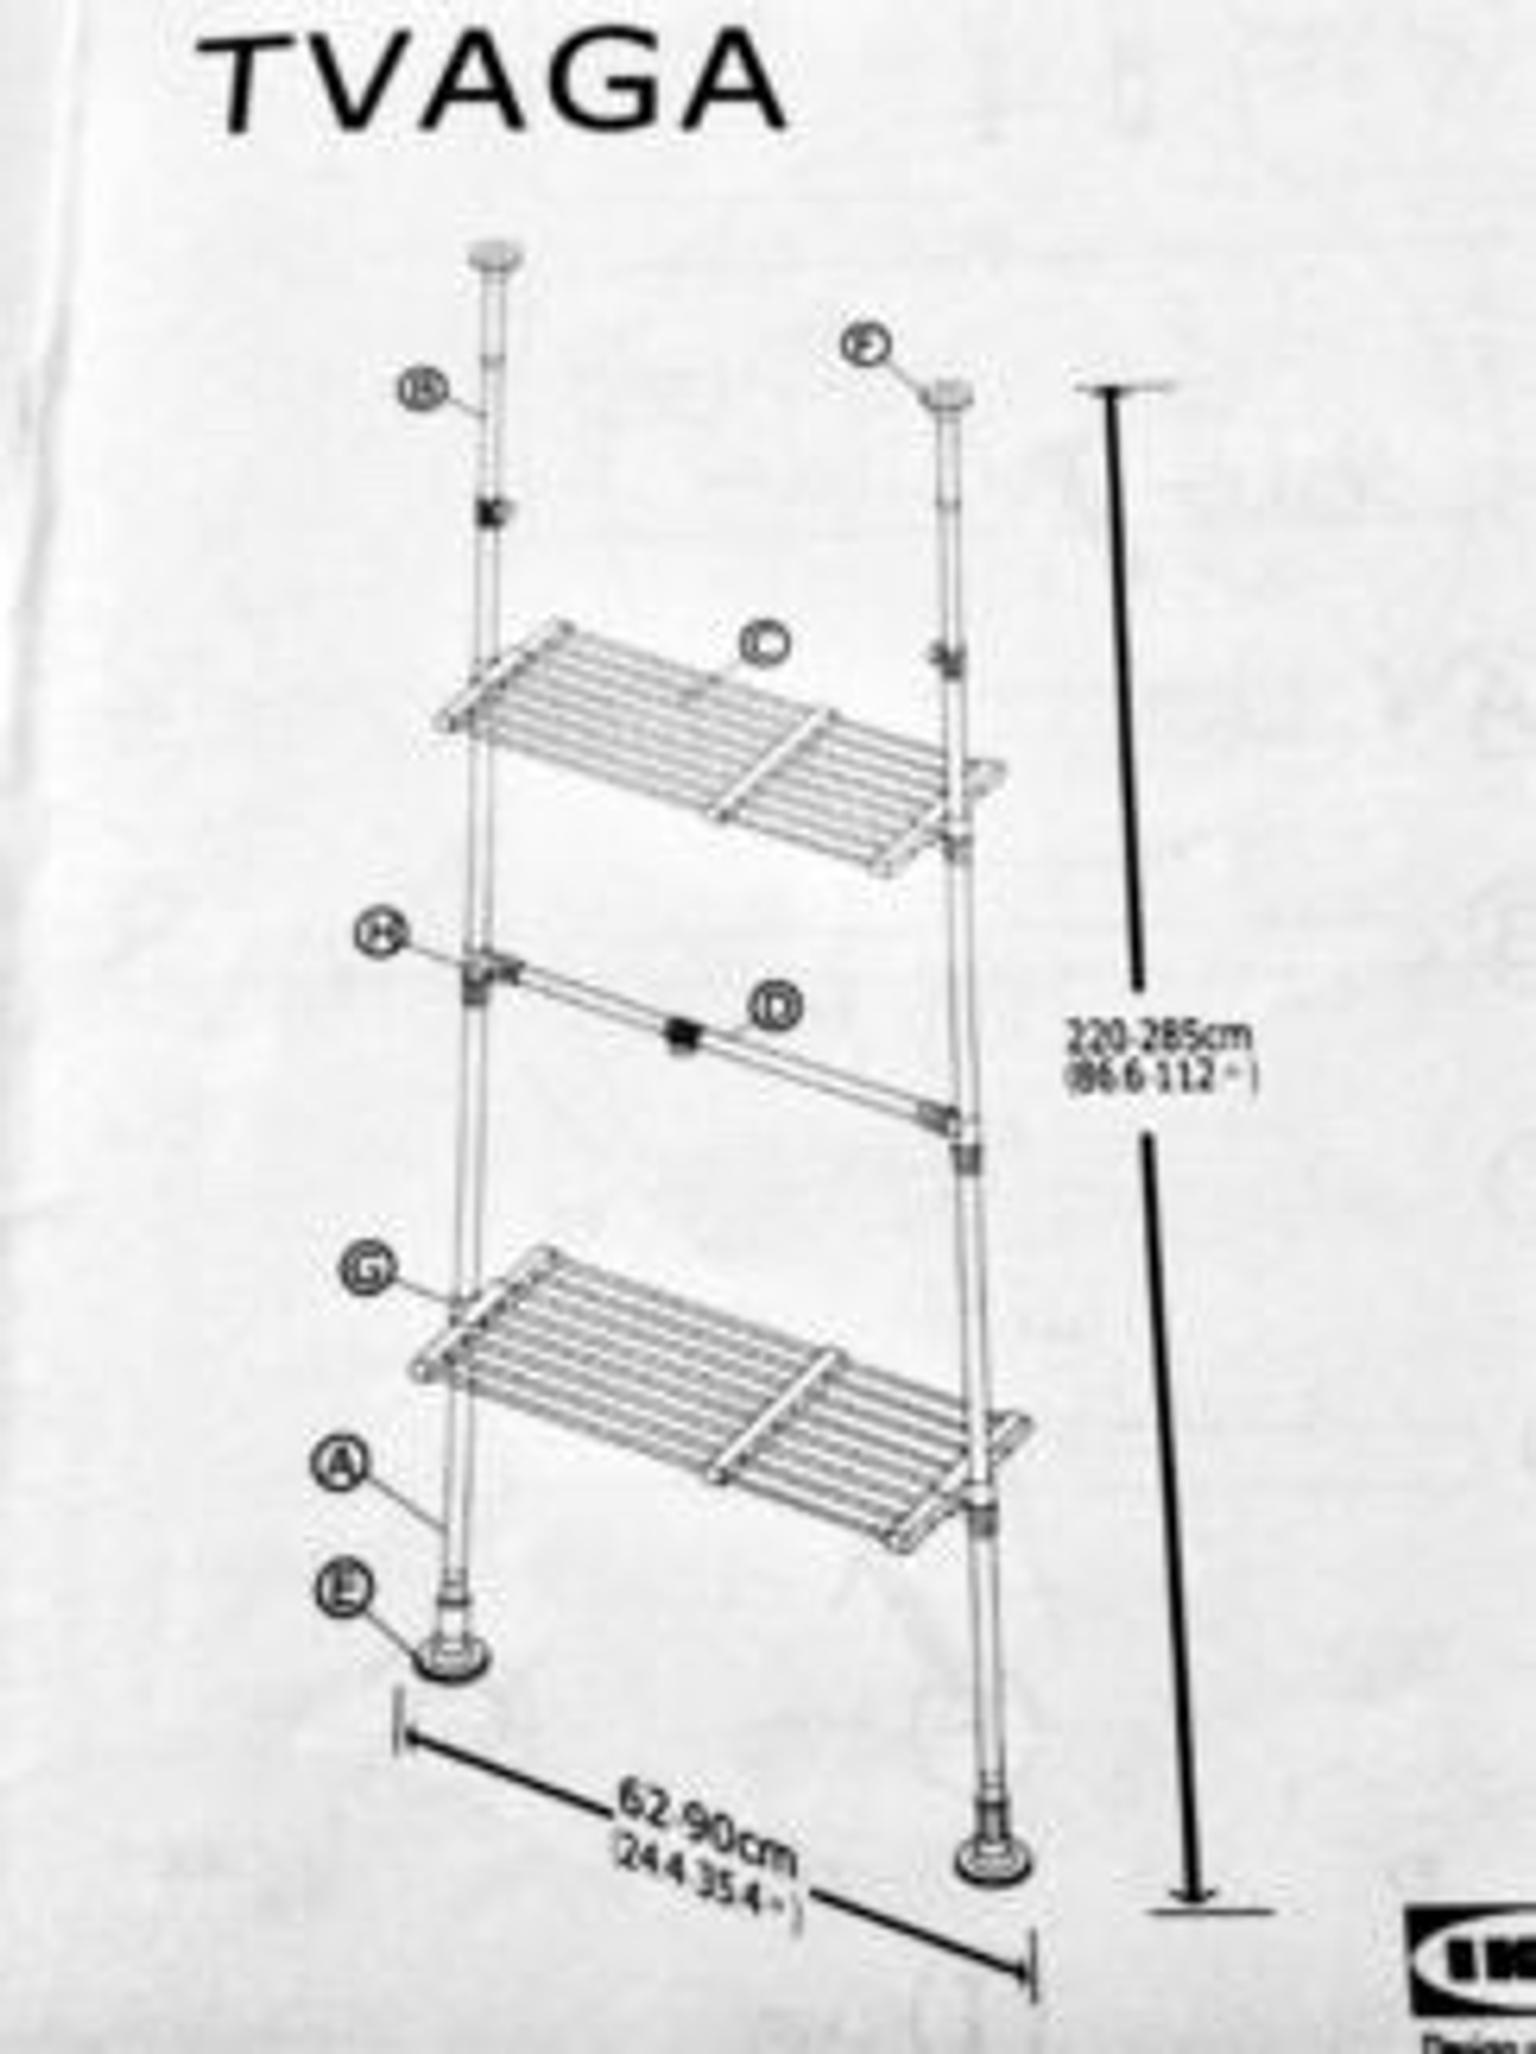 ikea tvaga extendable clothes shelf rail